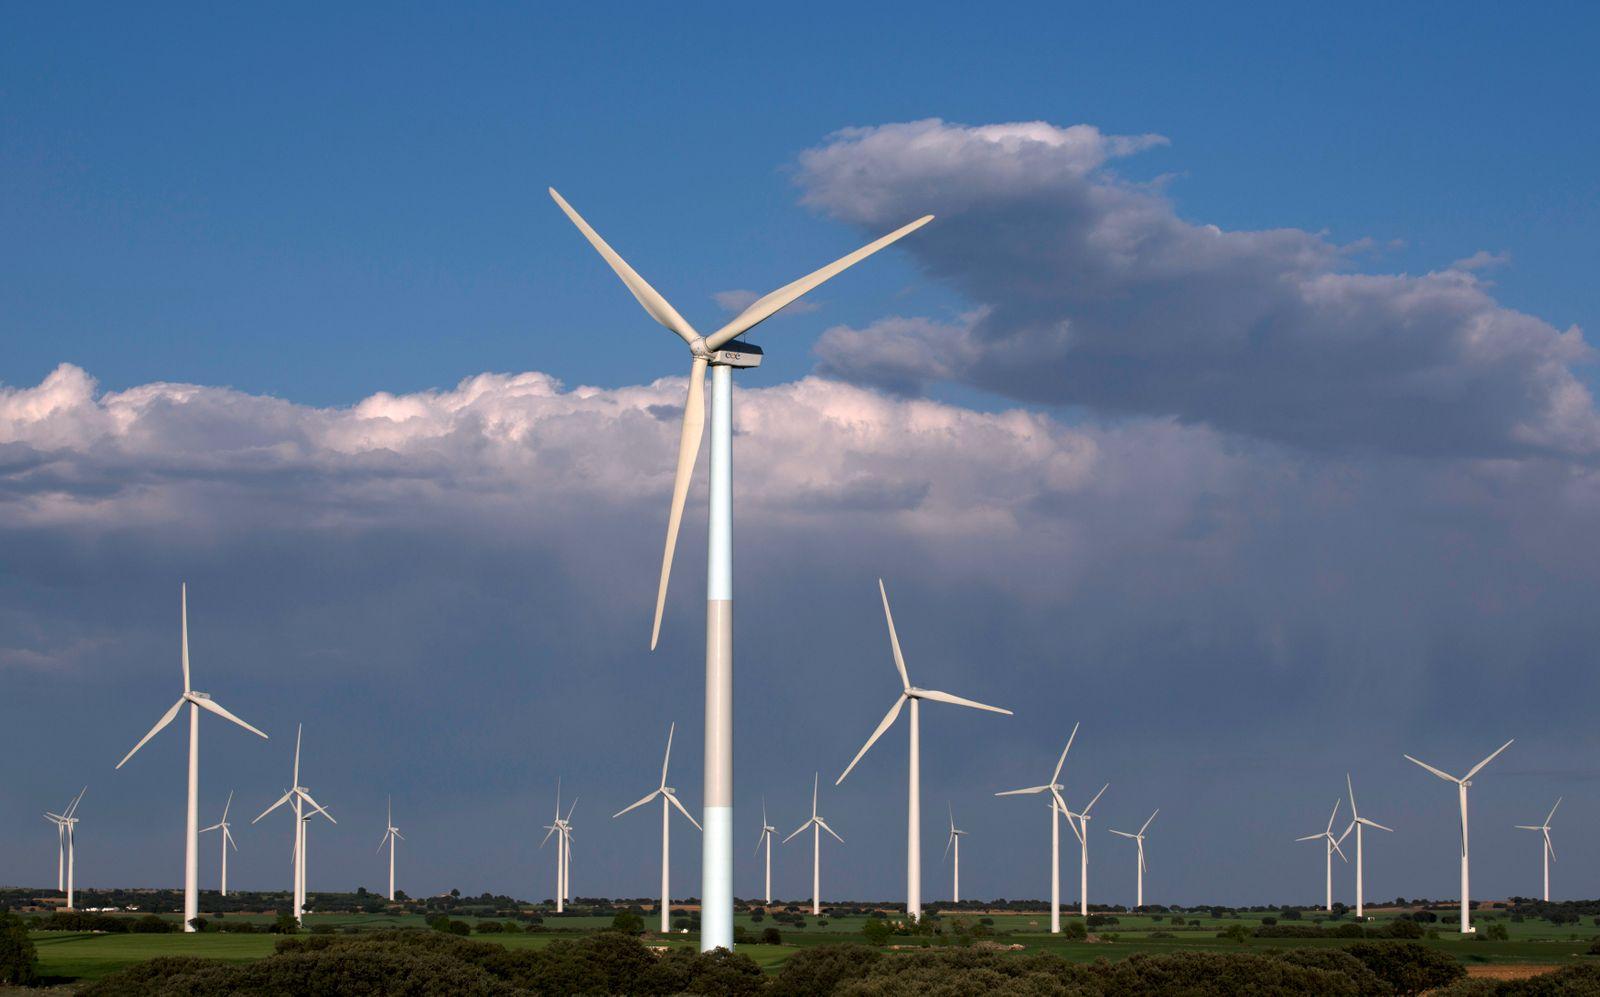 Wind turbines are seen in a field in Tebar